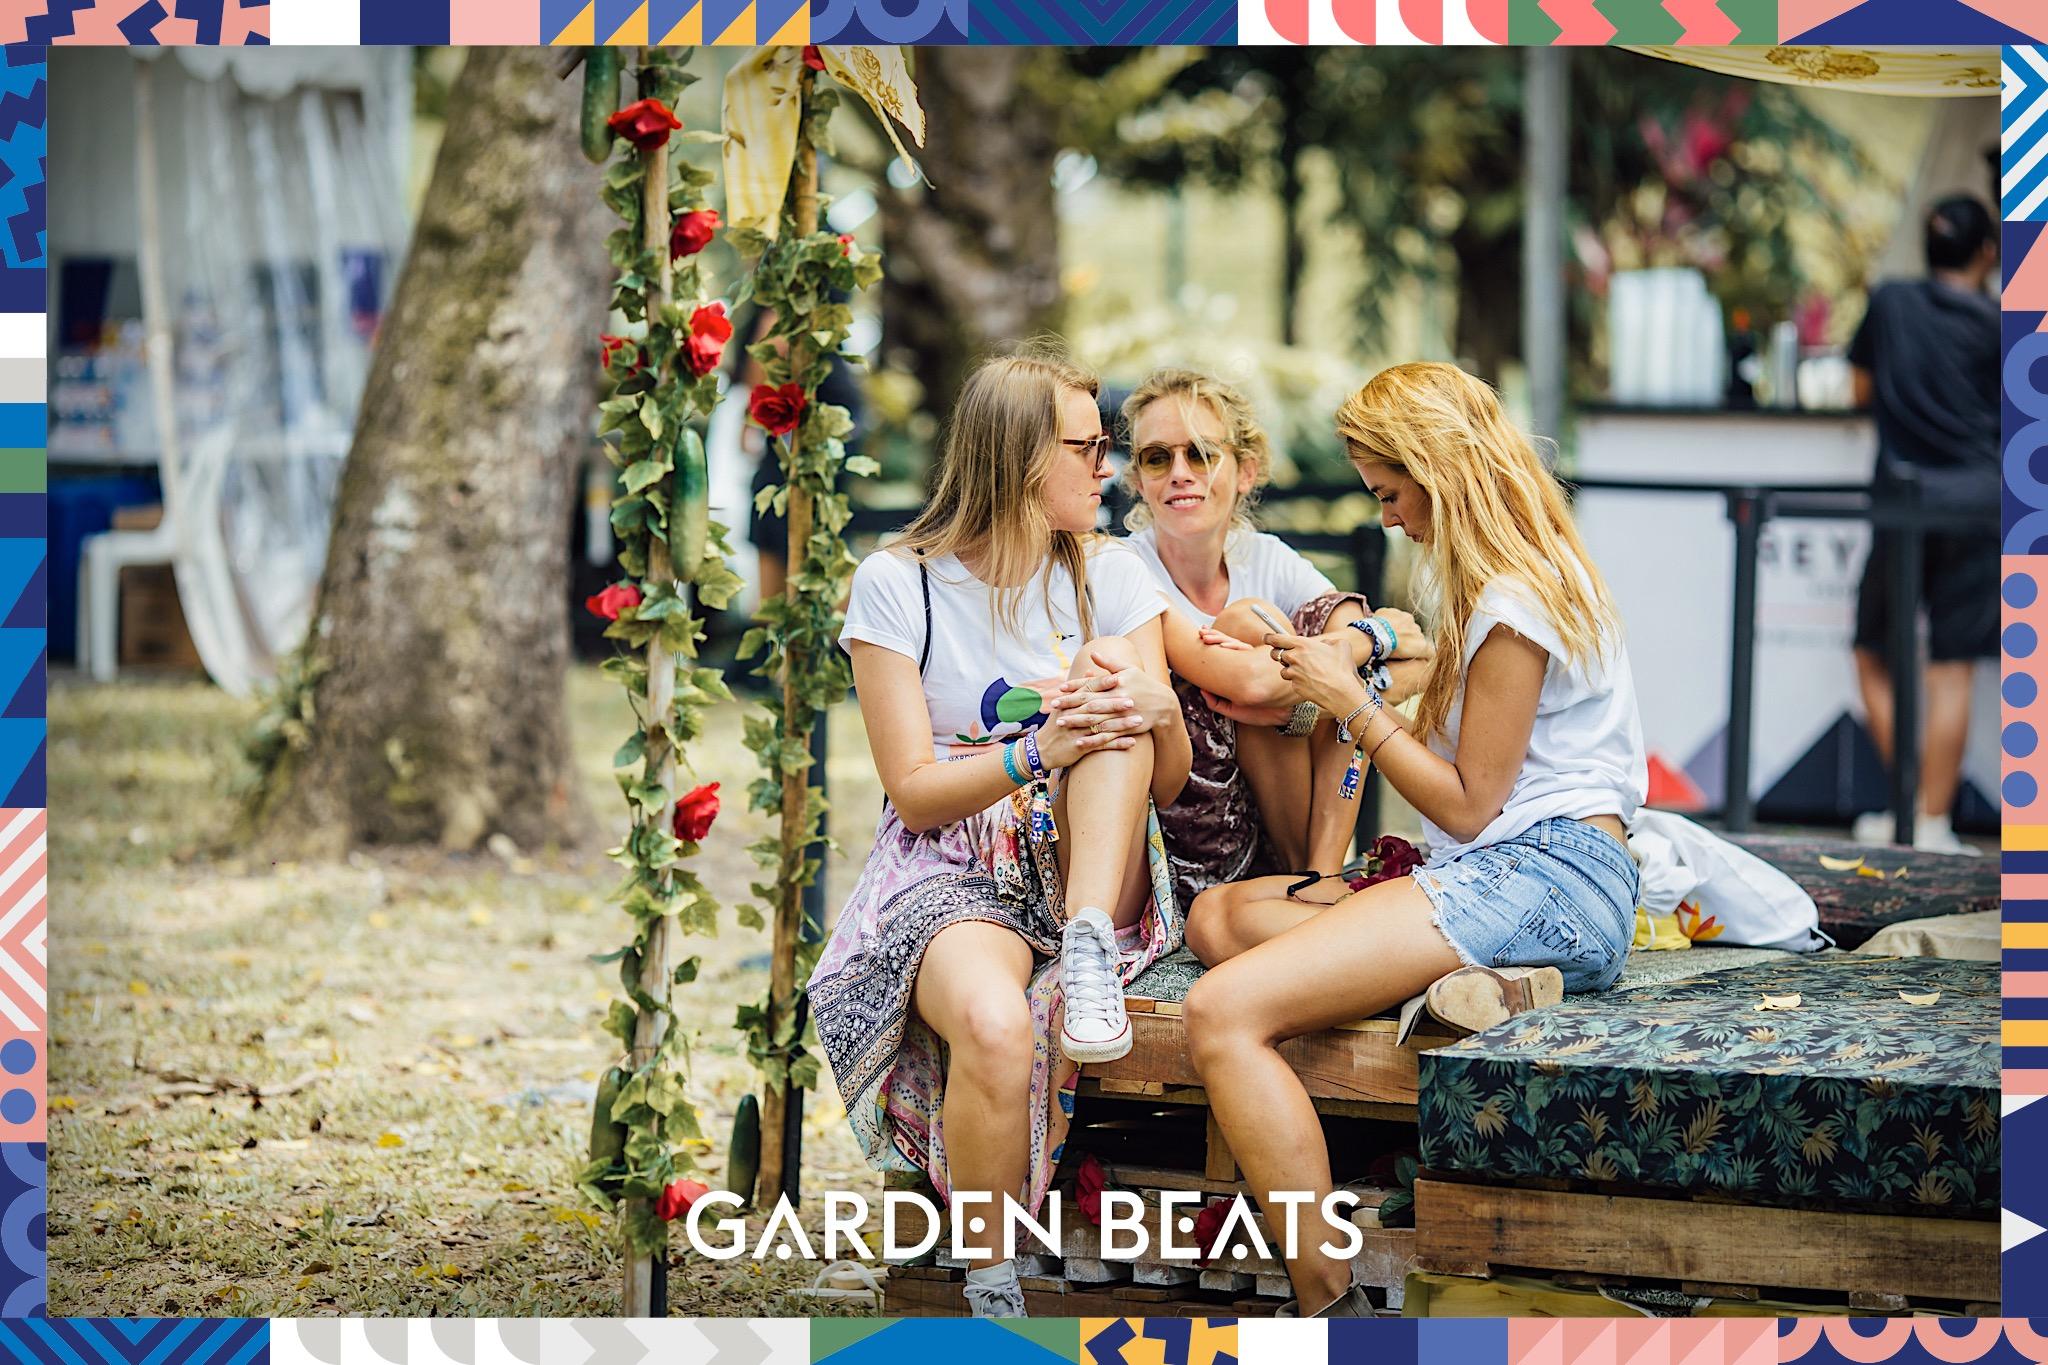 18032017_GardenBeats_Colossal139_WatermarkedGB.jpg